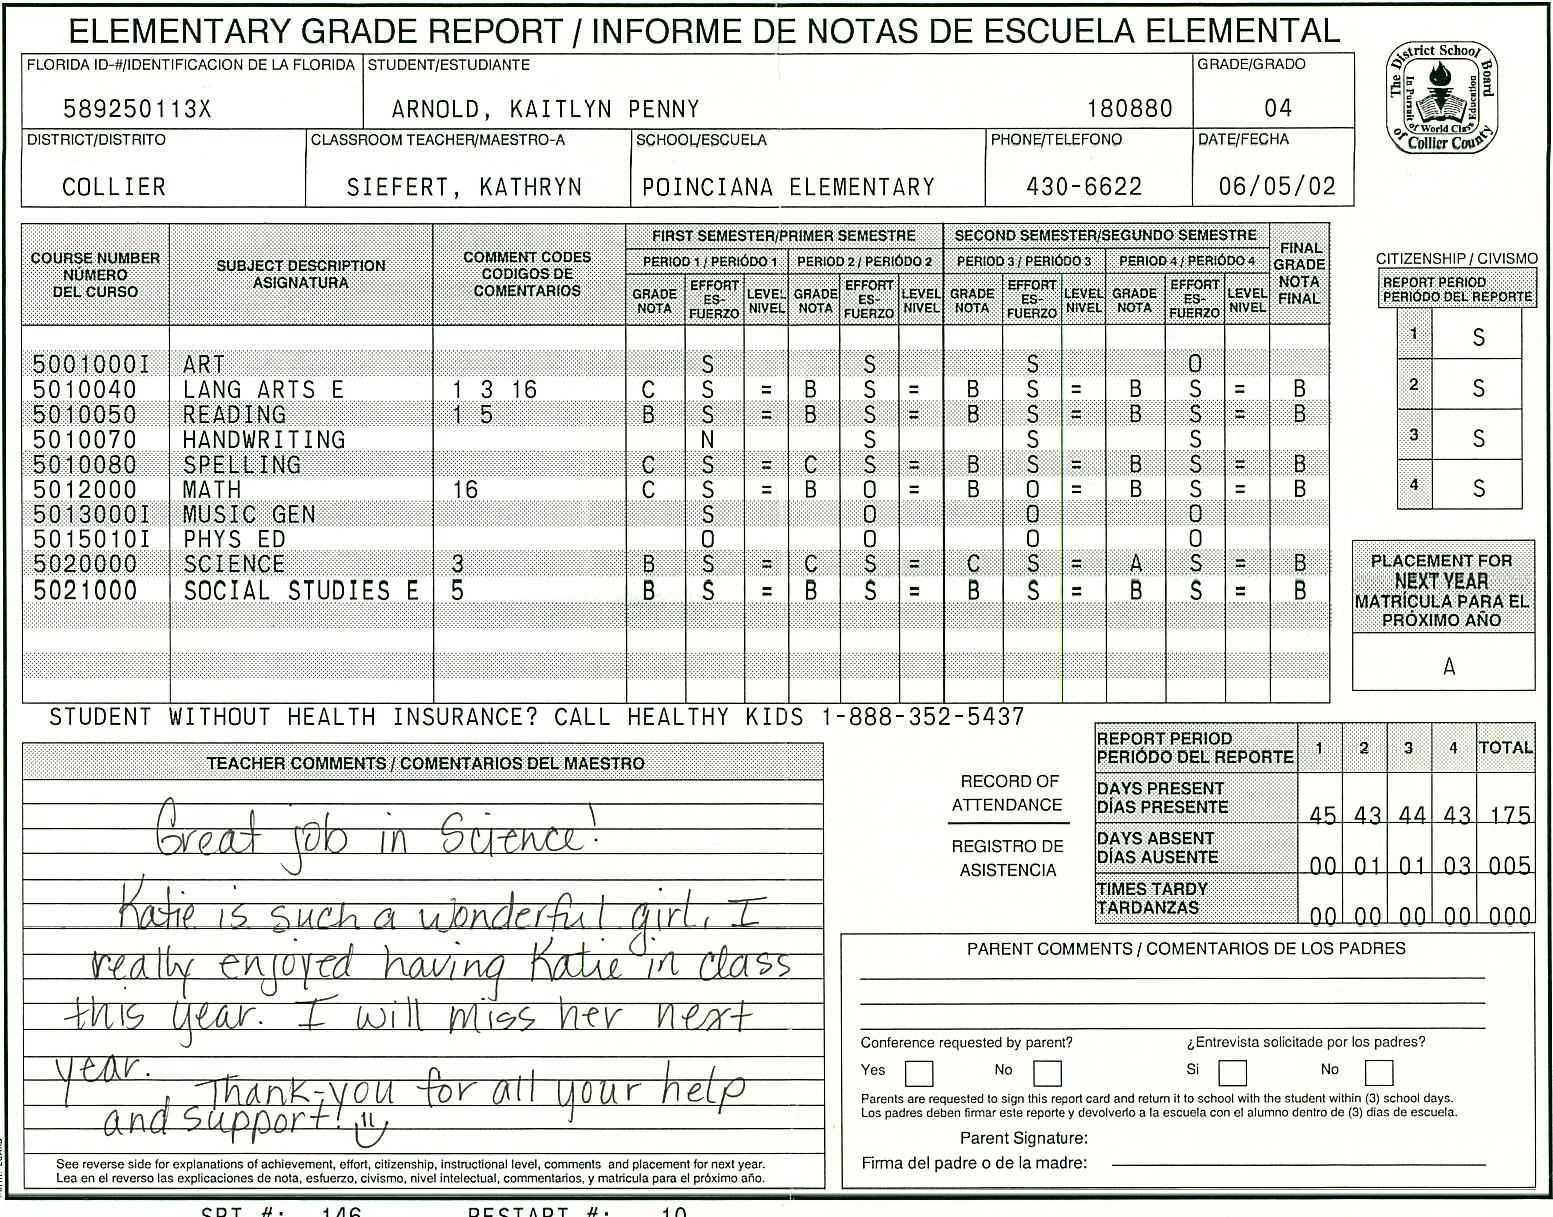 Elementary School Report Card Template | Report Card pertaining to Fake Report Card Template